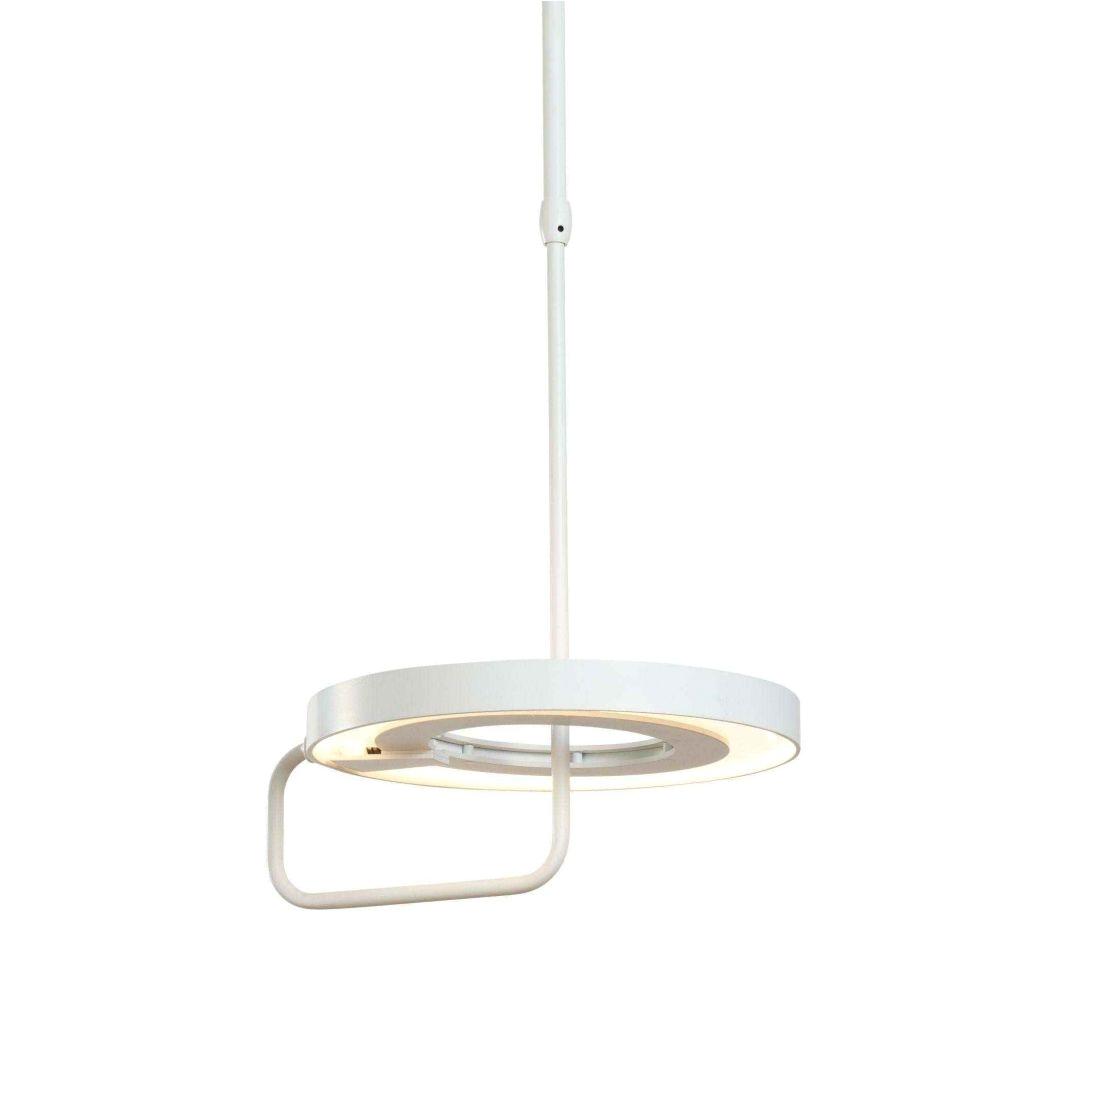 dazzling brass light fixtures such as black and brass chandelier led pendant light fixtures unique 16 gem